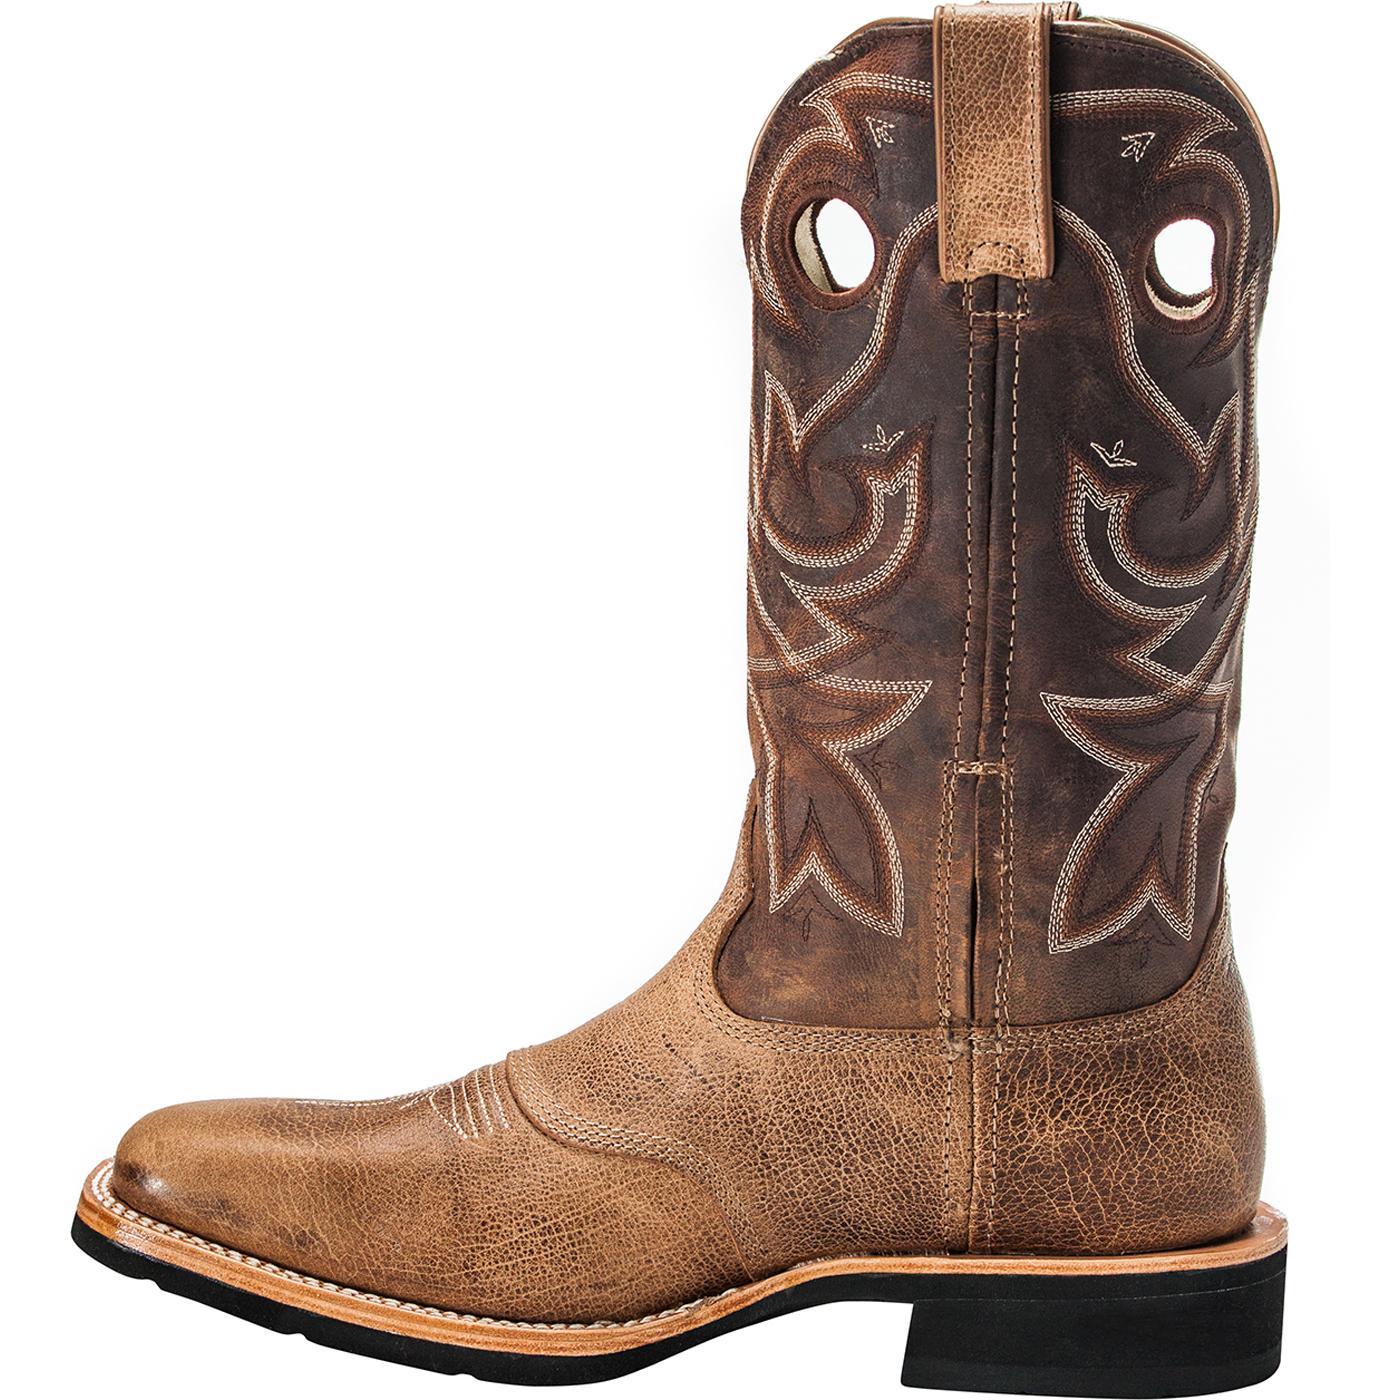 39794c6f12b Rocky Dually Crepe EX4 - Square Toe Western Boot